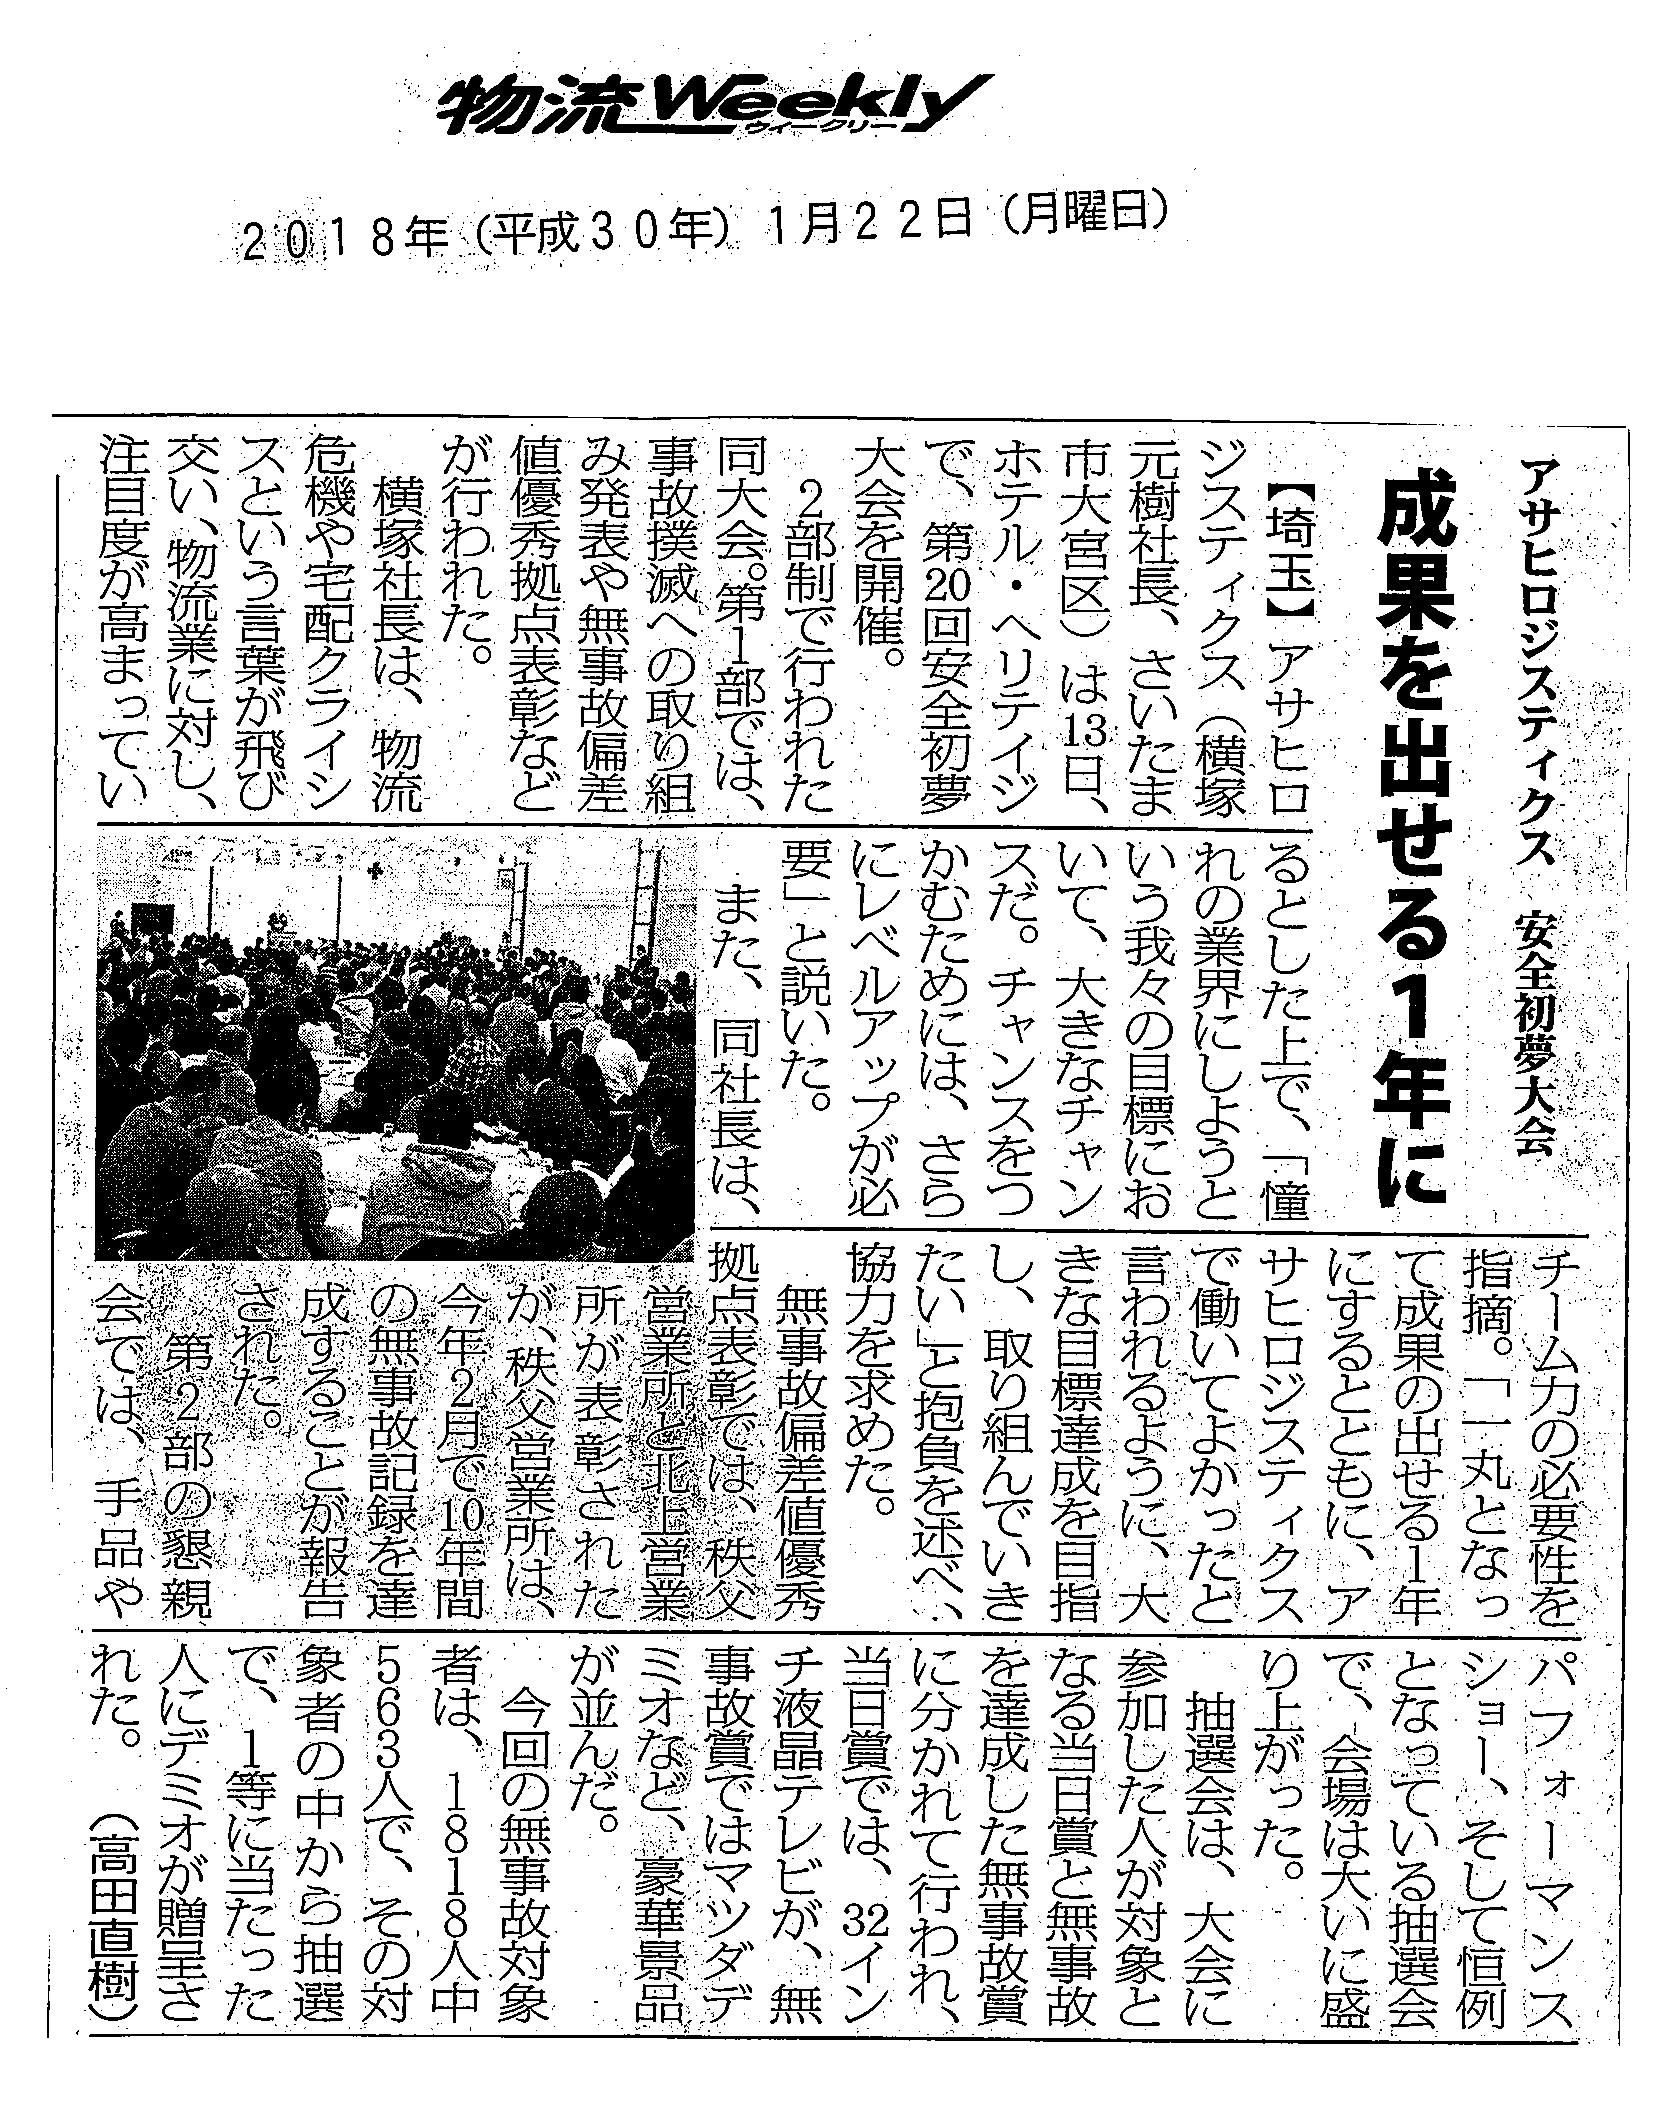 2018.01.22 物流Weekly 「安全初夢大会」